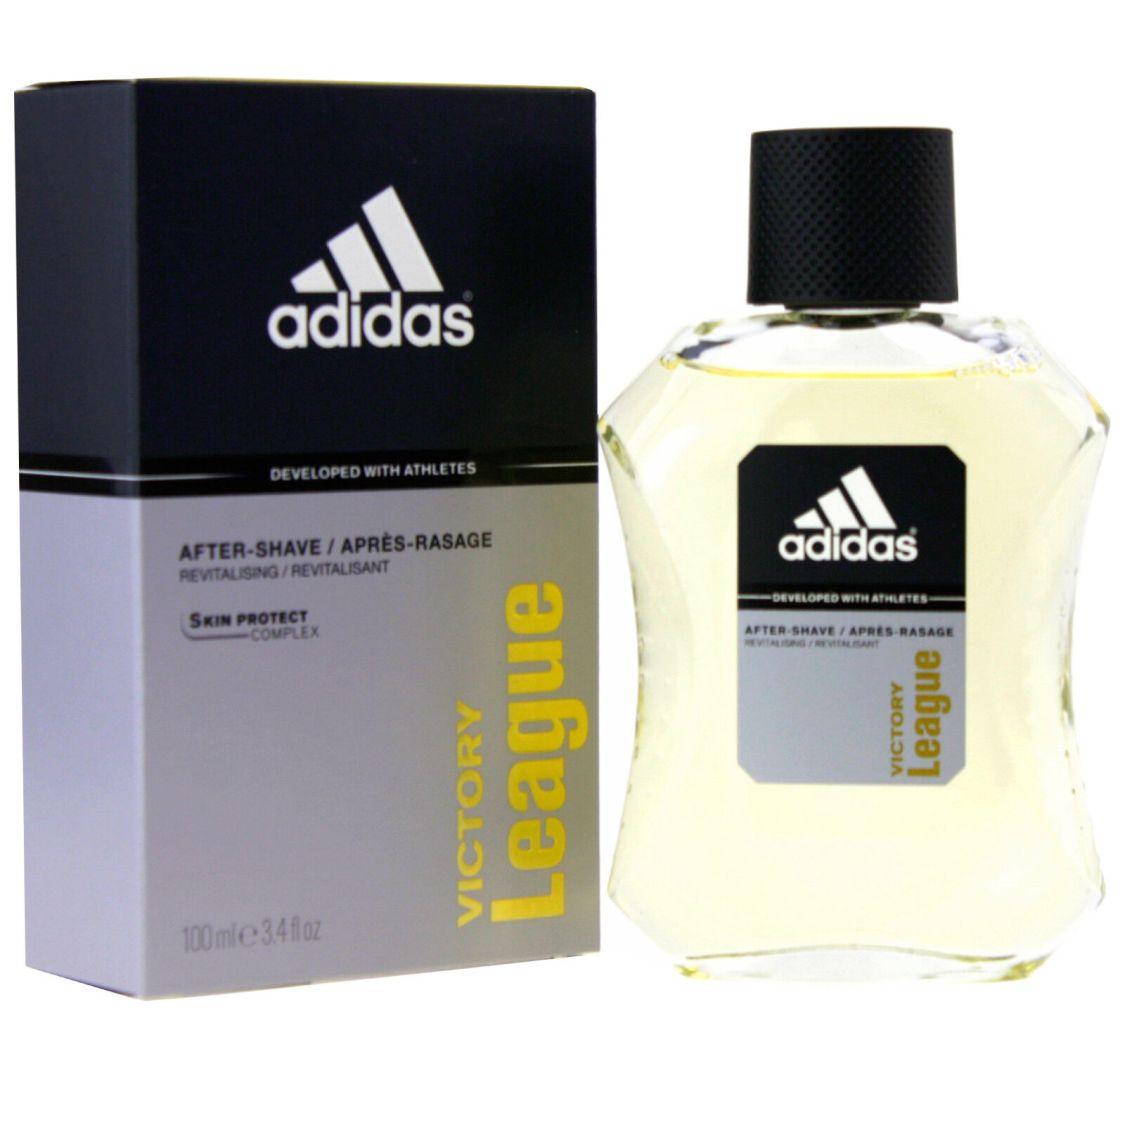 2 x 100ml Adidas Aftershave Victory League Rasierwasser Aftershave Herrenpflege